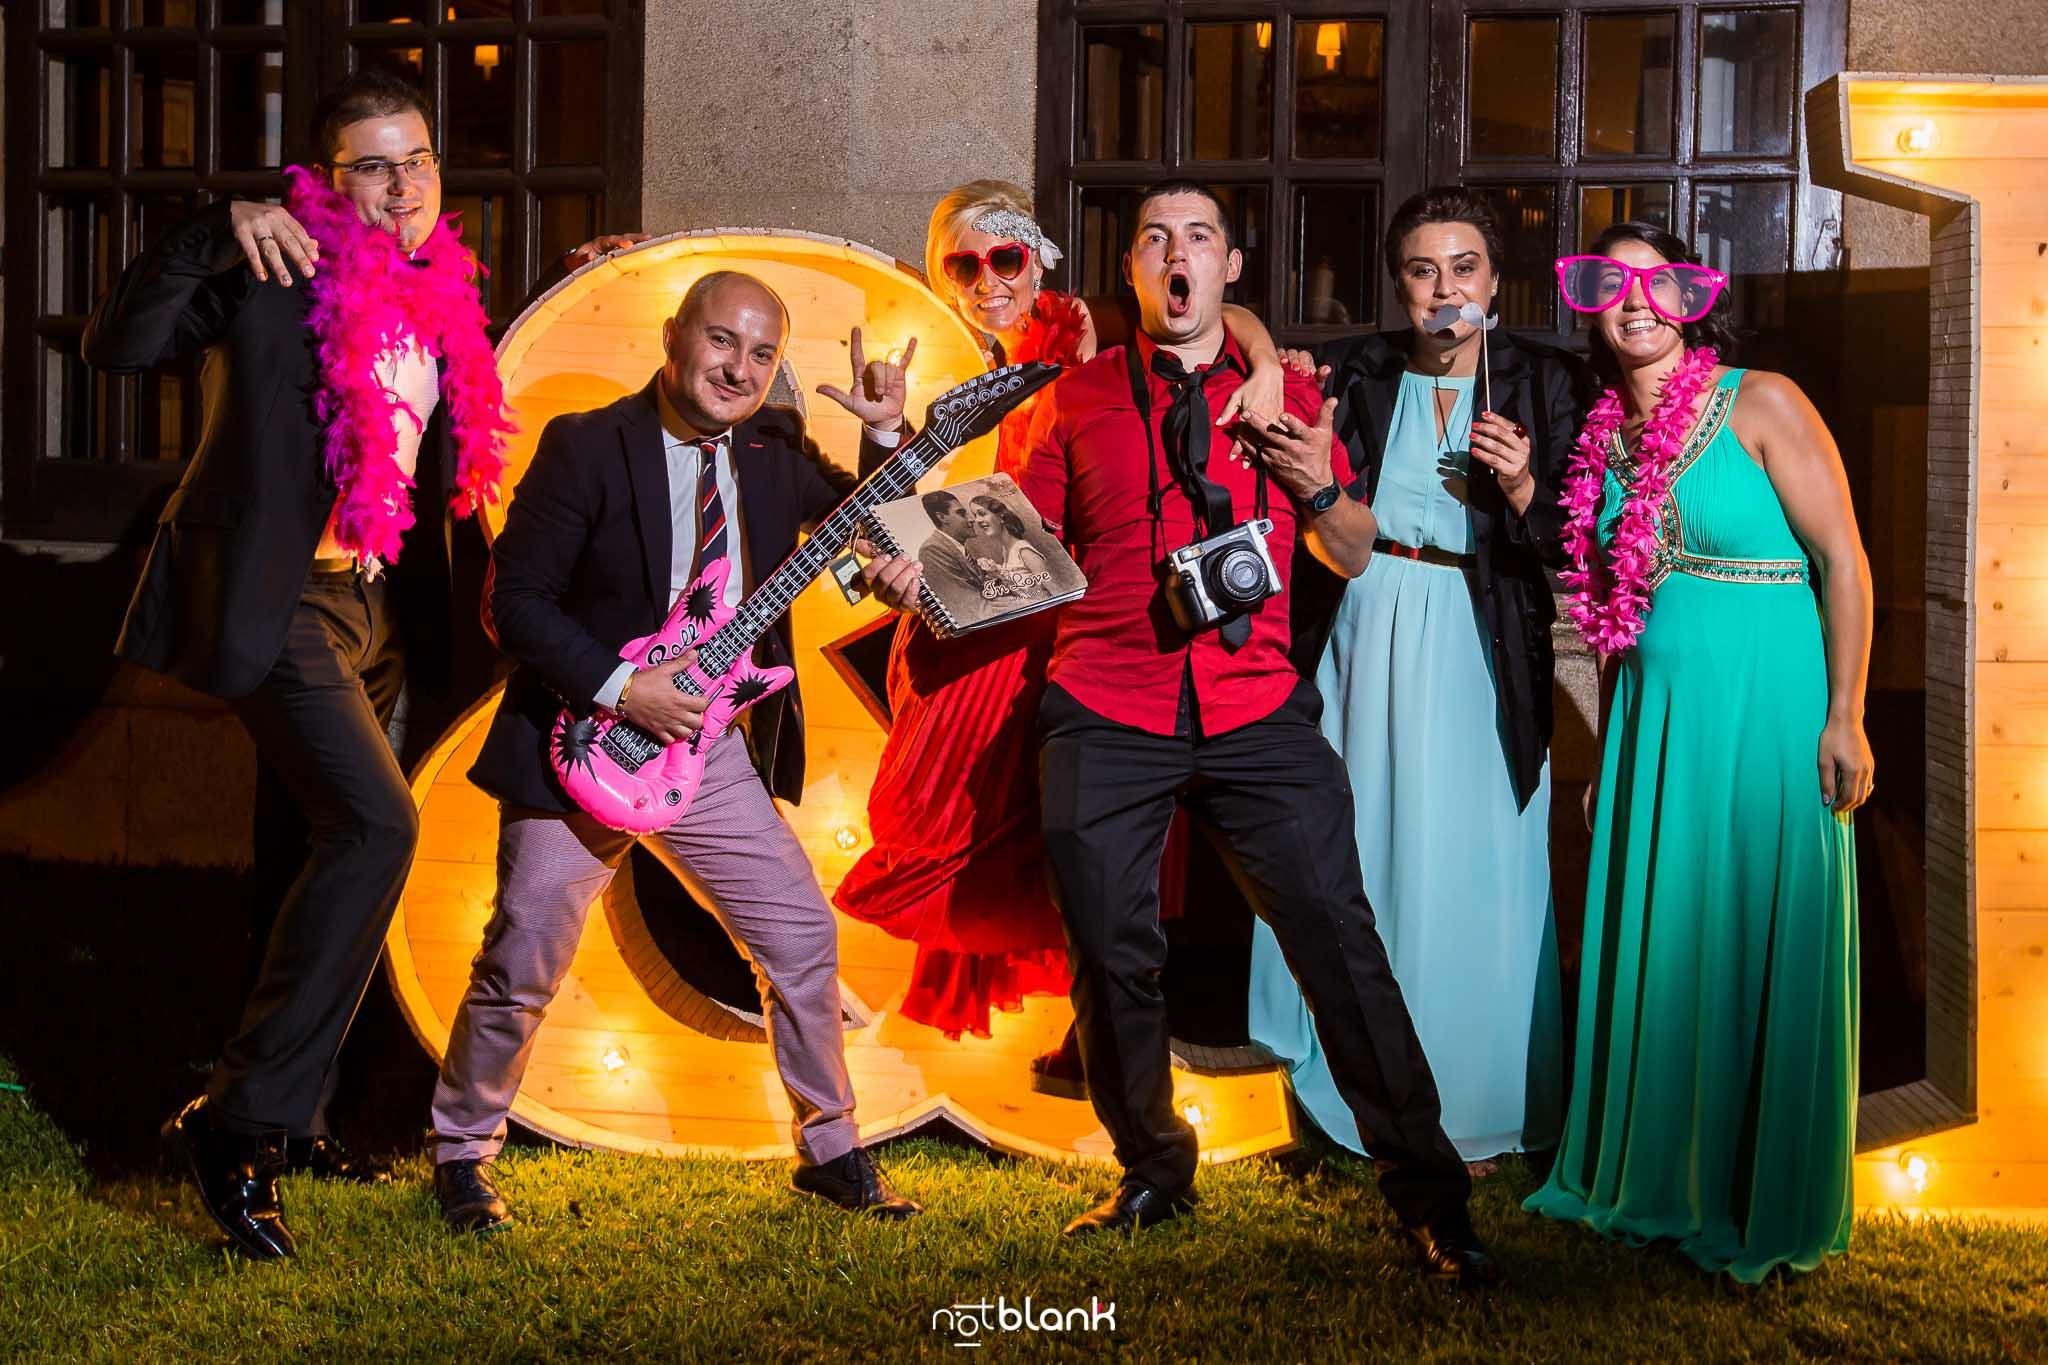 Photocall-Parador de Baiona-Parador de Bayona-Fiesta-Rock and Roll-R&R-Guitarra eléctrica-Fotografo de boda